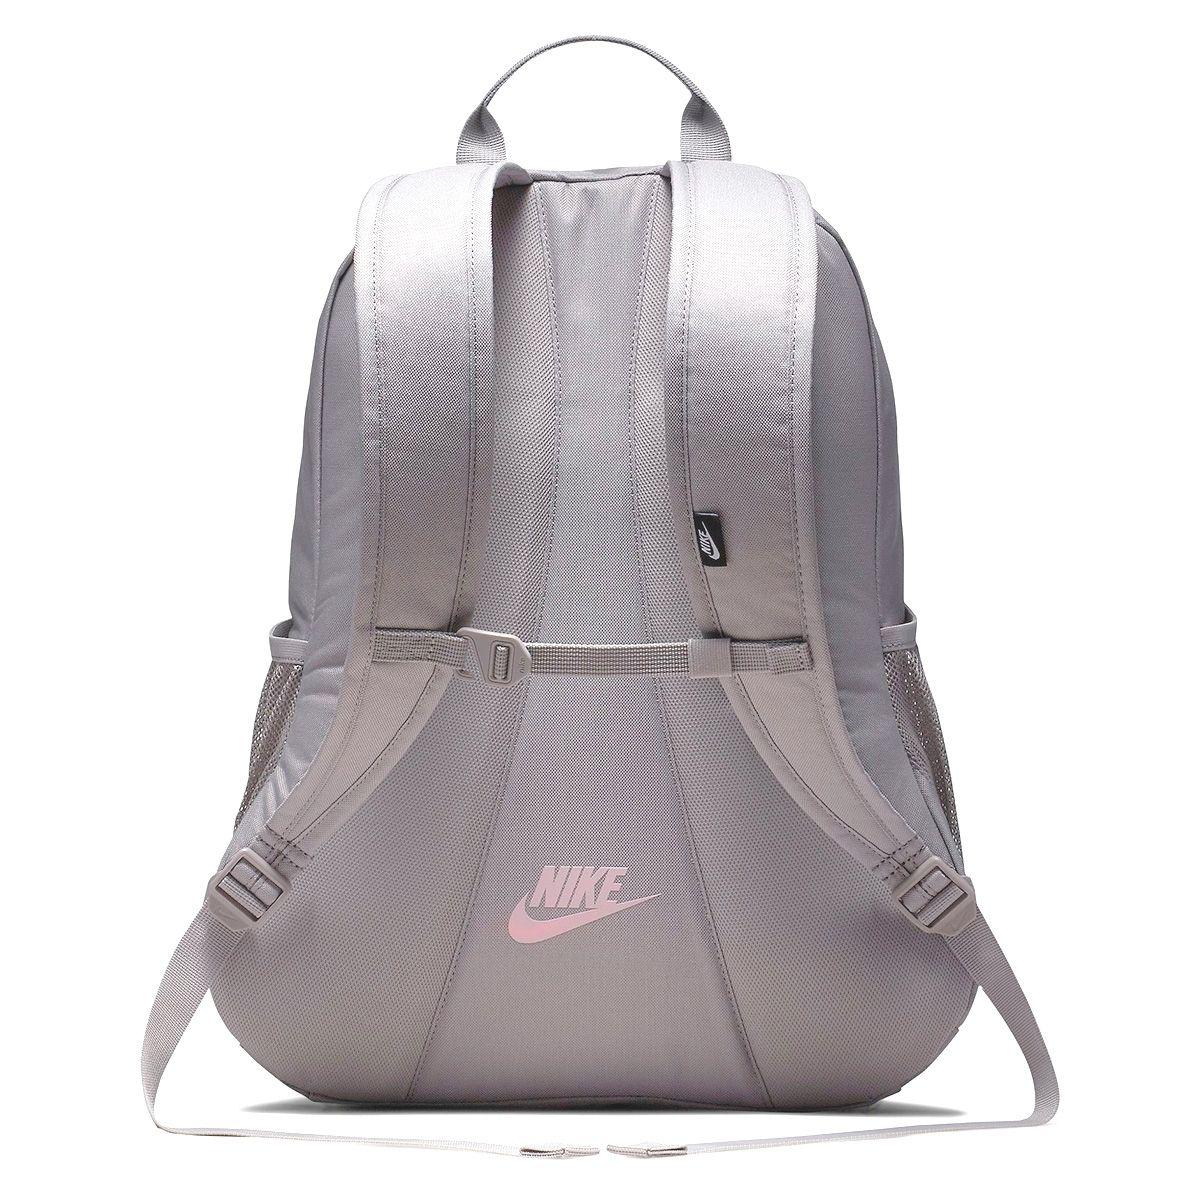 04080bc72115a Type Backpacks Nike Hayward Futura 2.0 Backpack